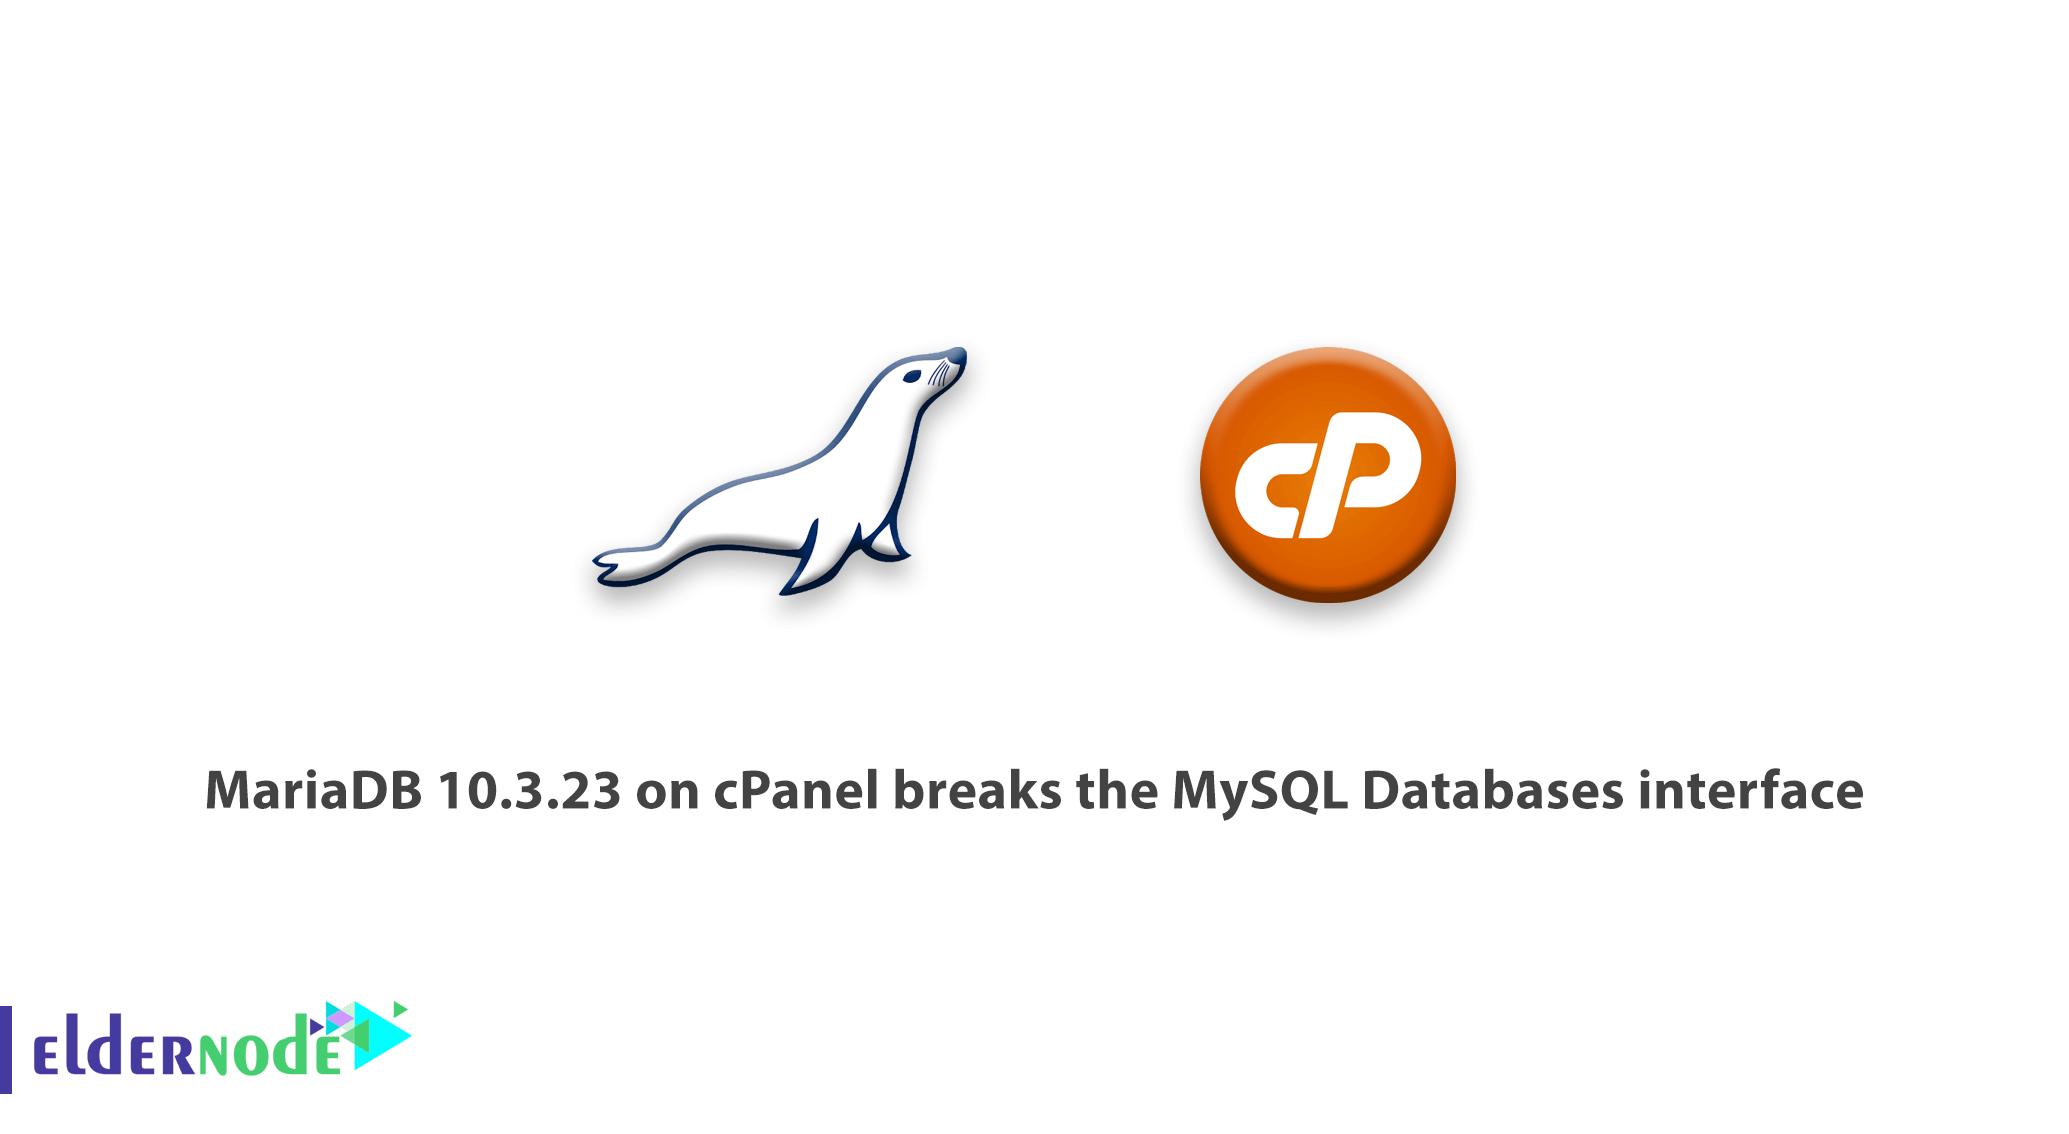 MariaDB 10.3.23 on cPanel breaks the MySQL Databases interface